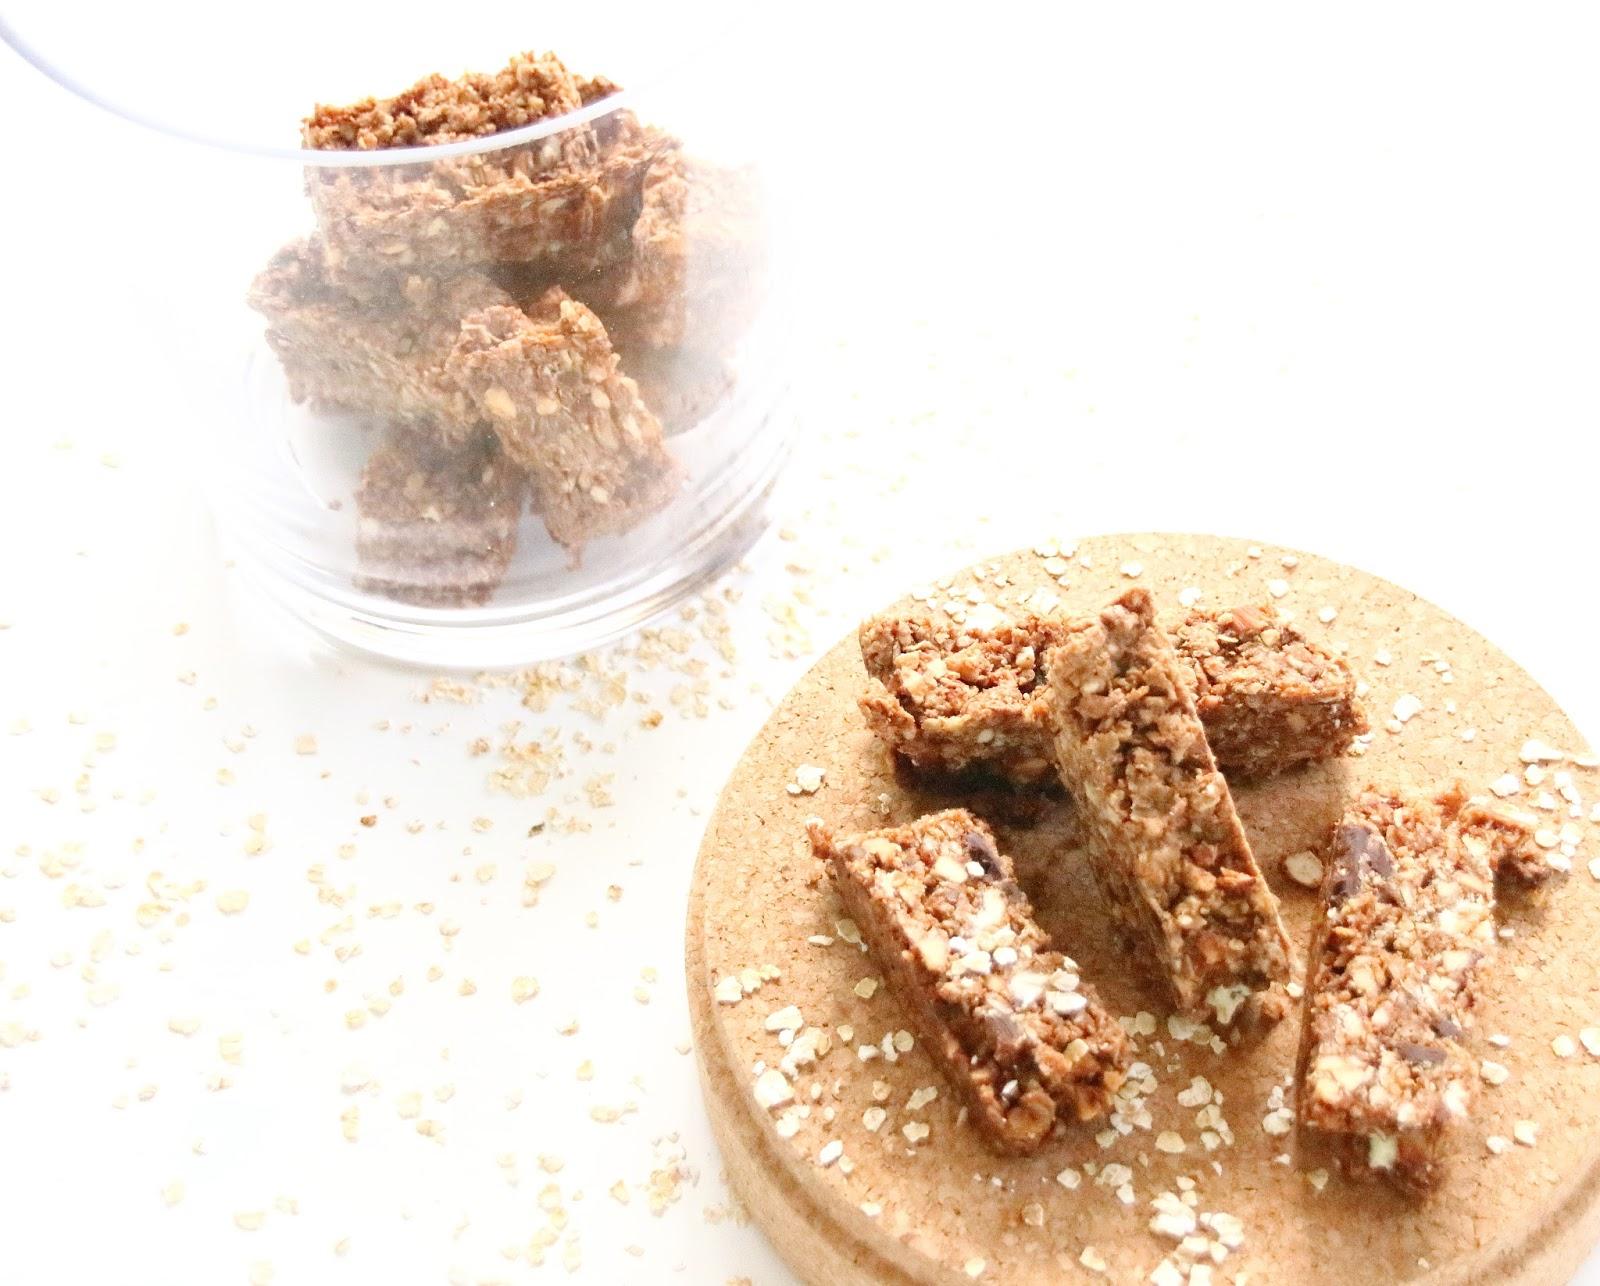 Triple chocolate almond granola bars